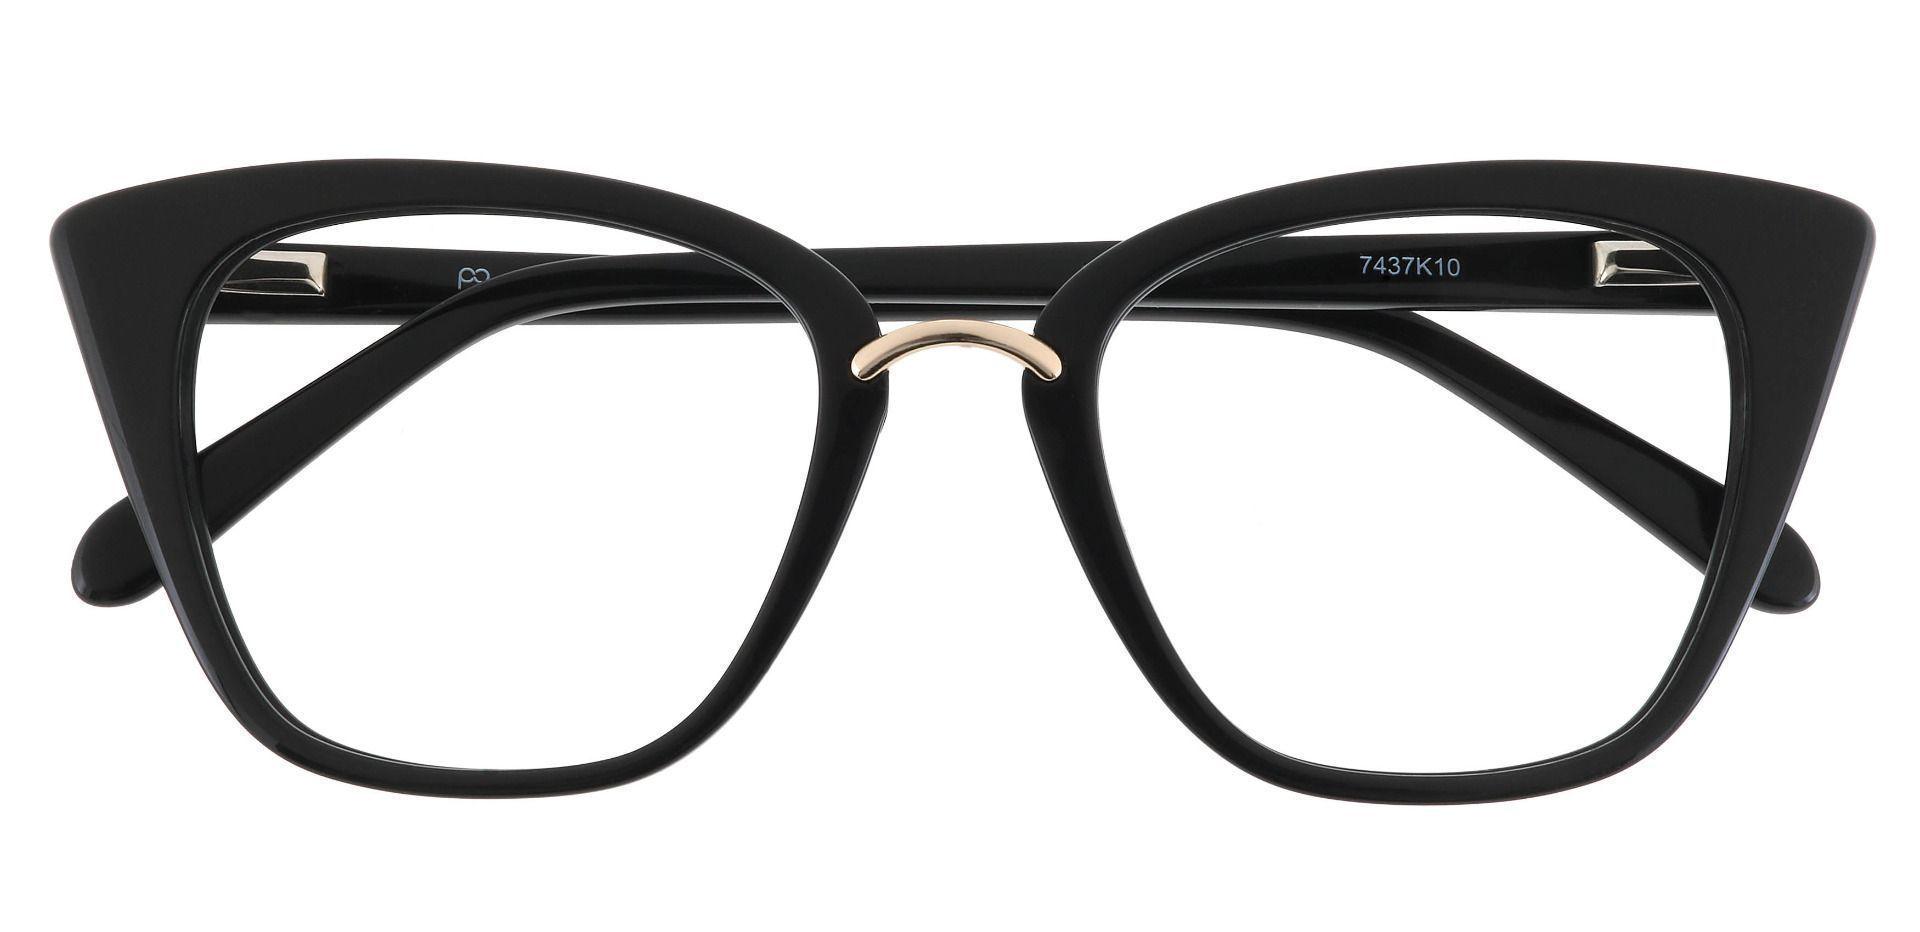 Sala Cat Eye Prescription Glasses - Black